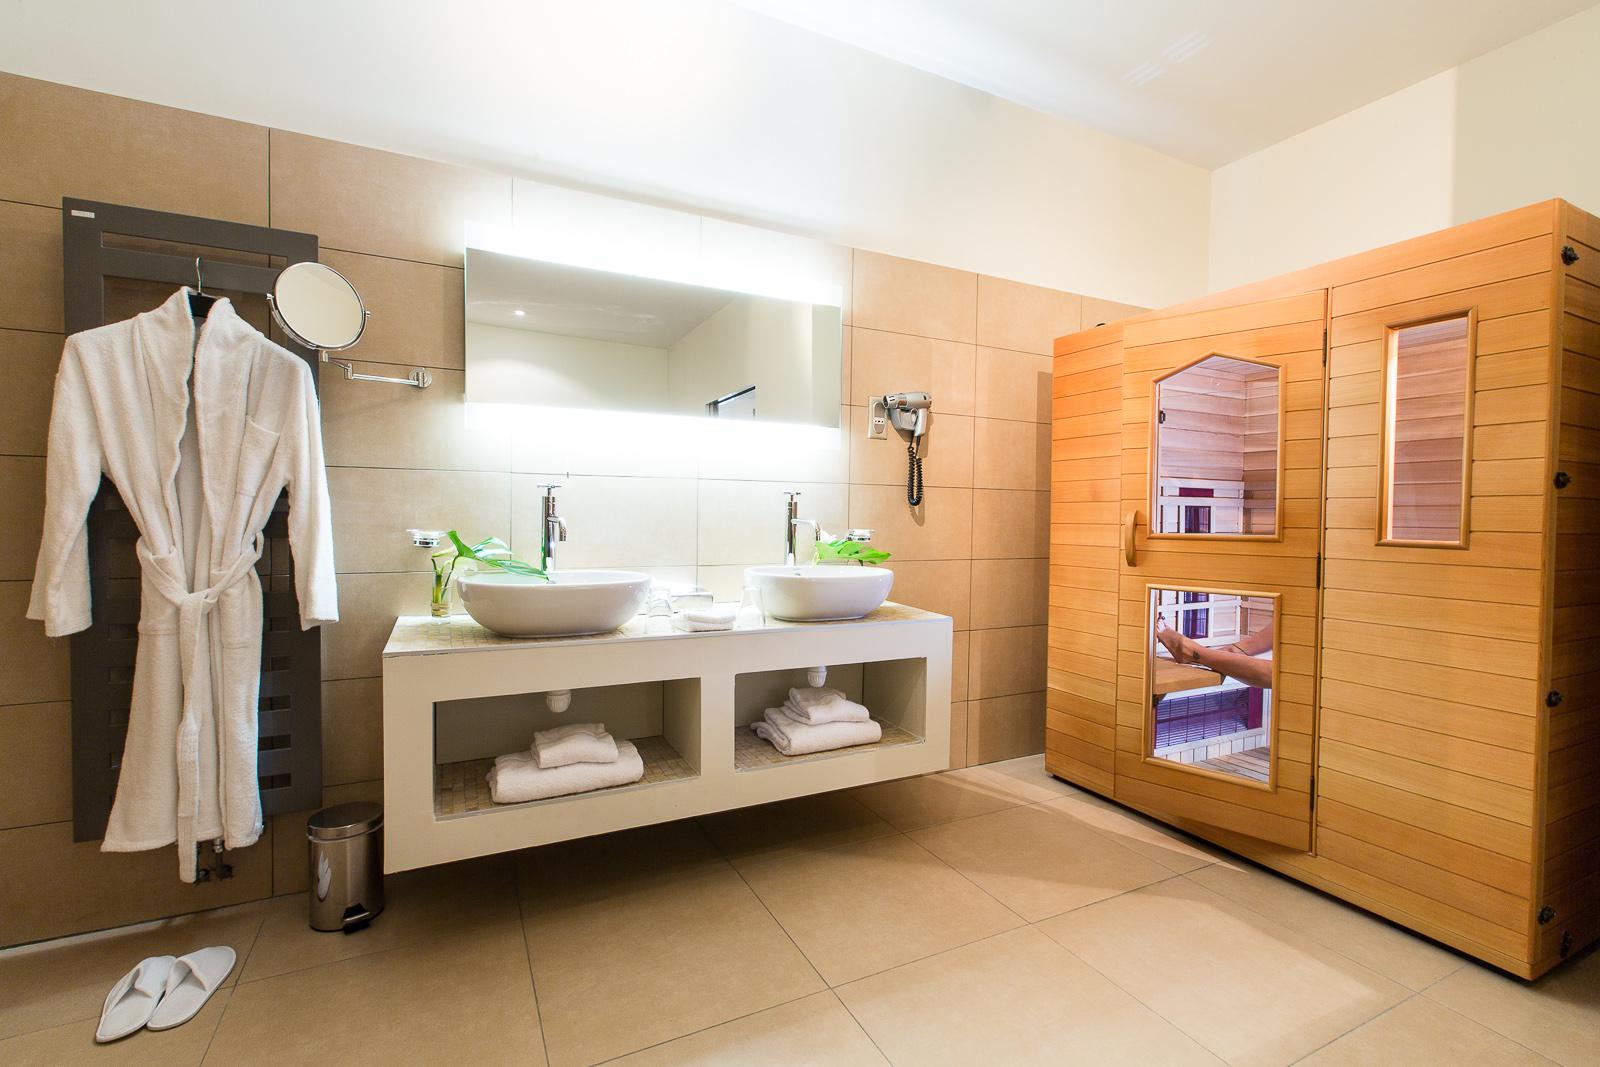 Hôtel Marotte suite Sauna